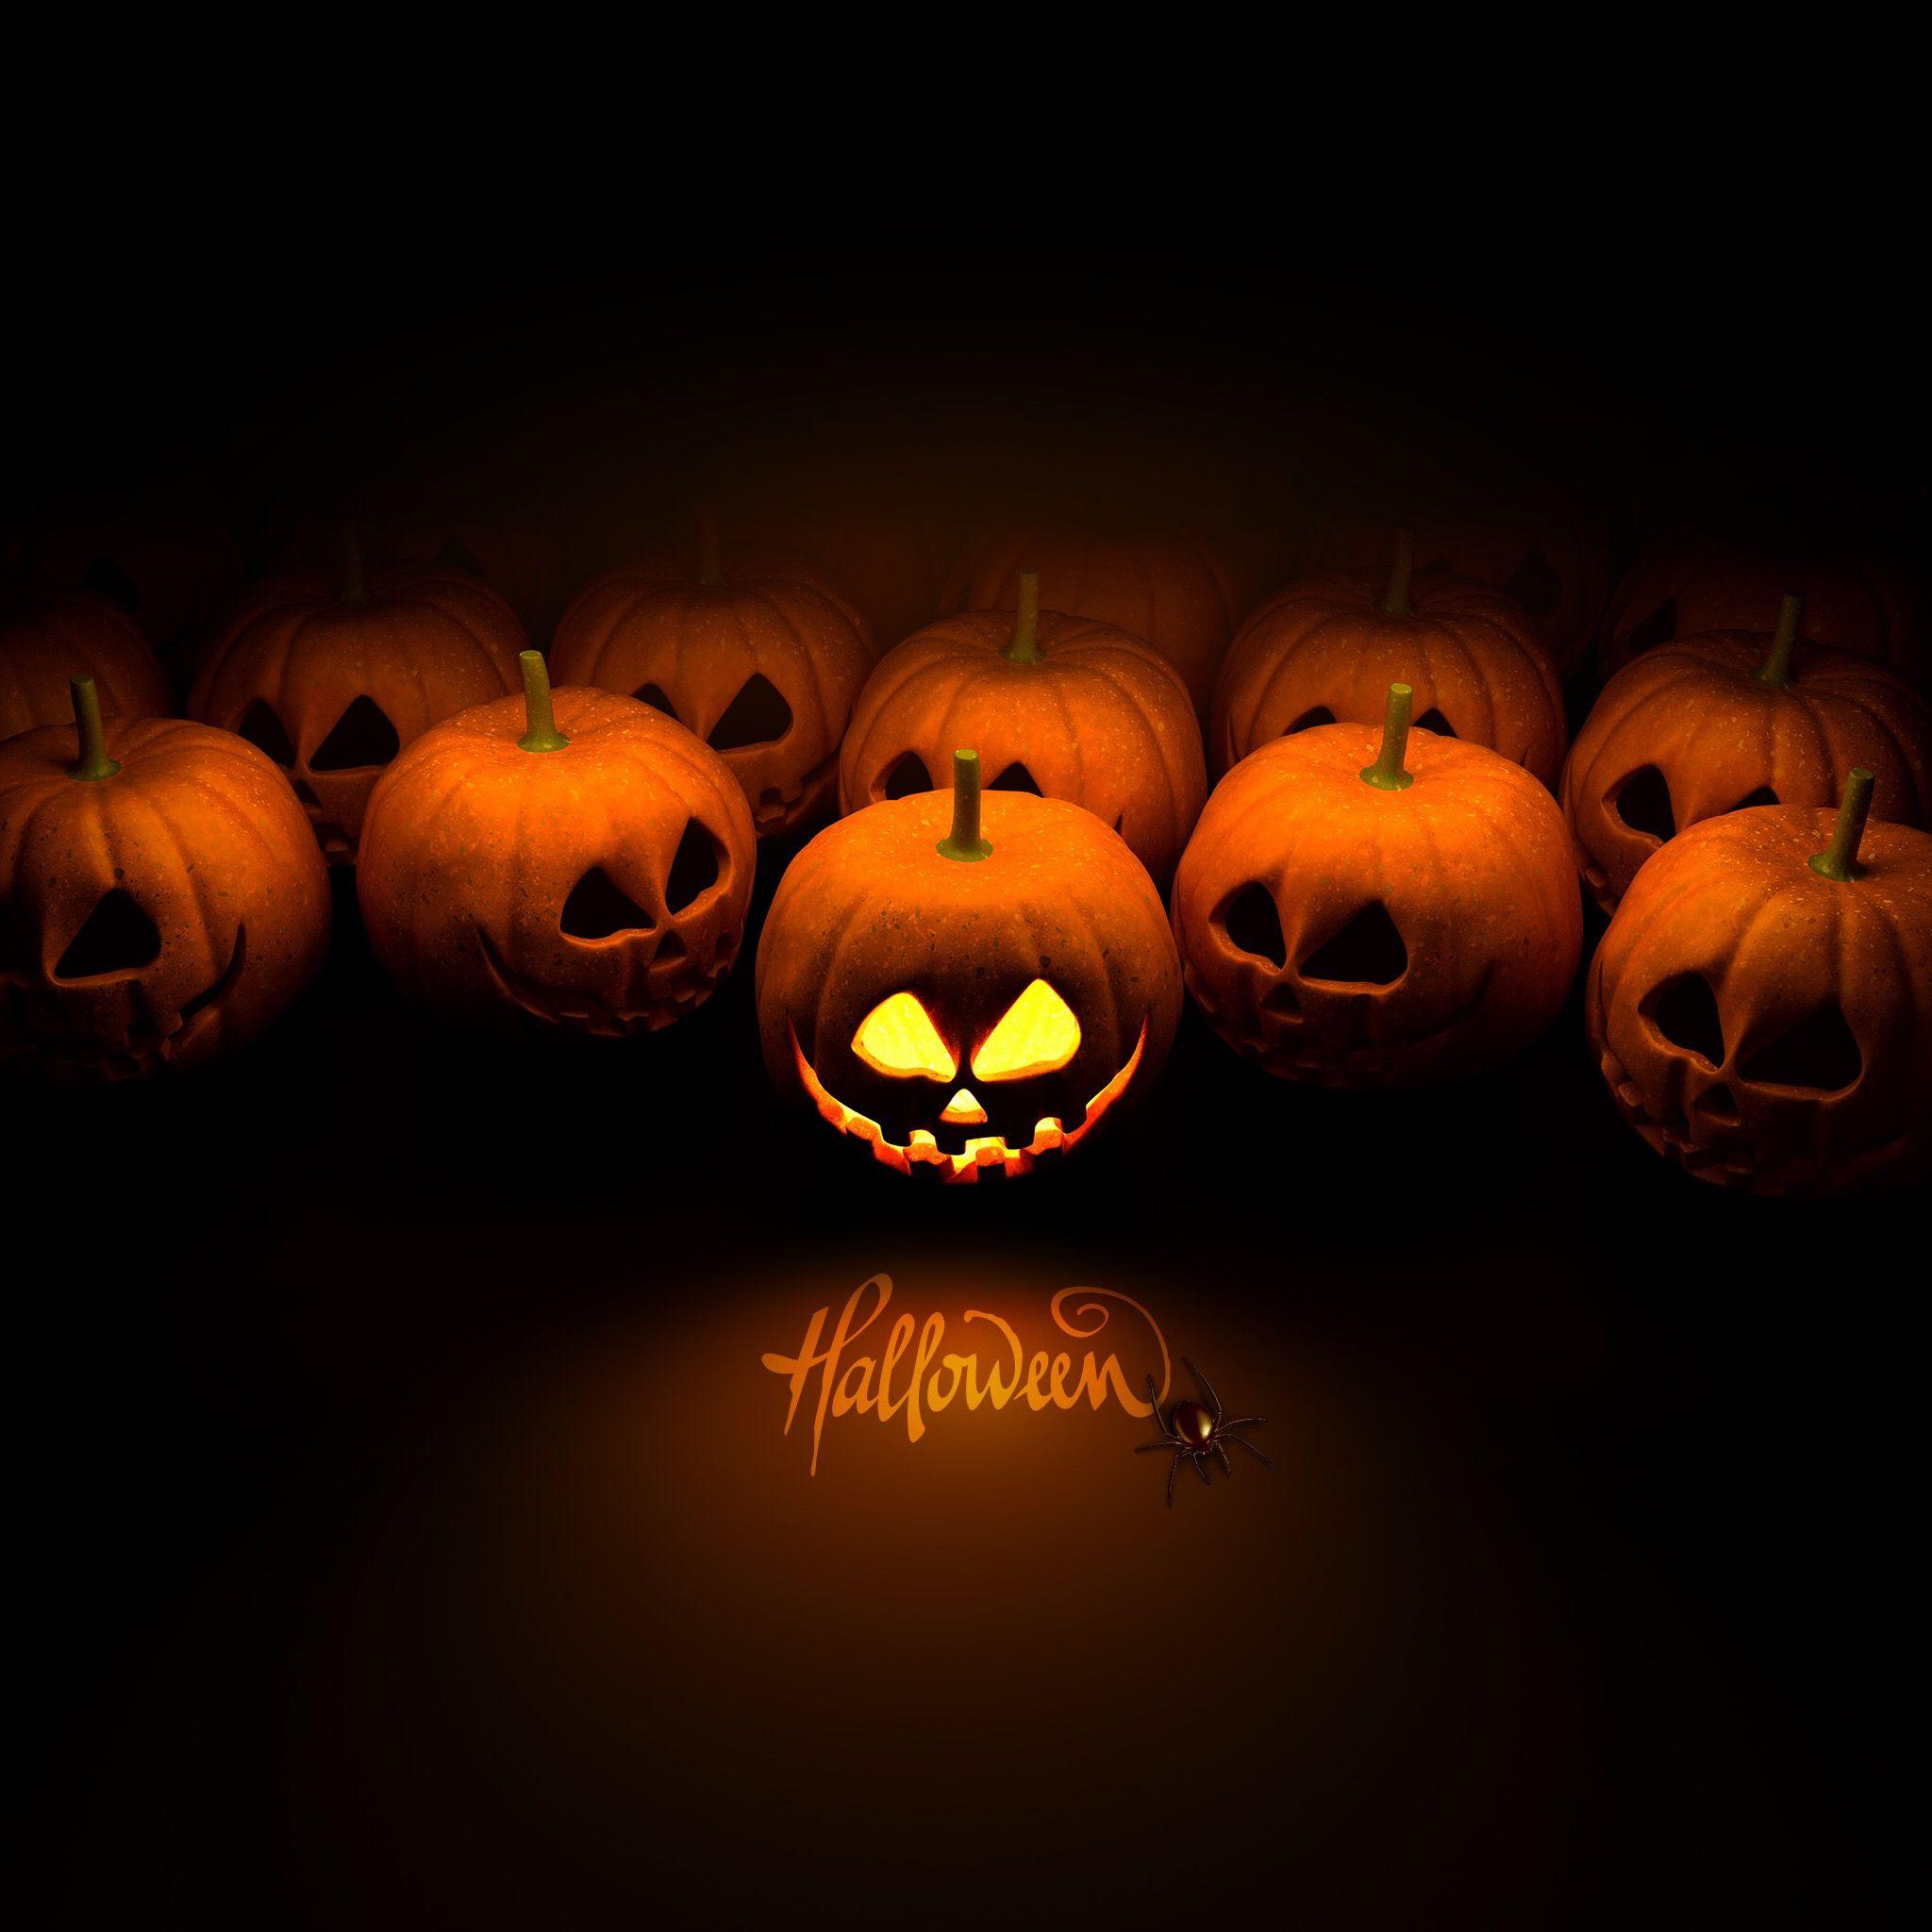 Popular Wallpaper Halloween Iphone 4s - ef7585f573419cb63335f9db6c13e765  Image_173894.jpg